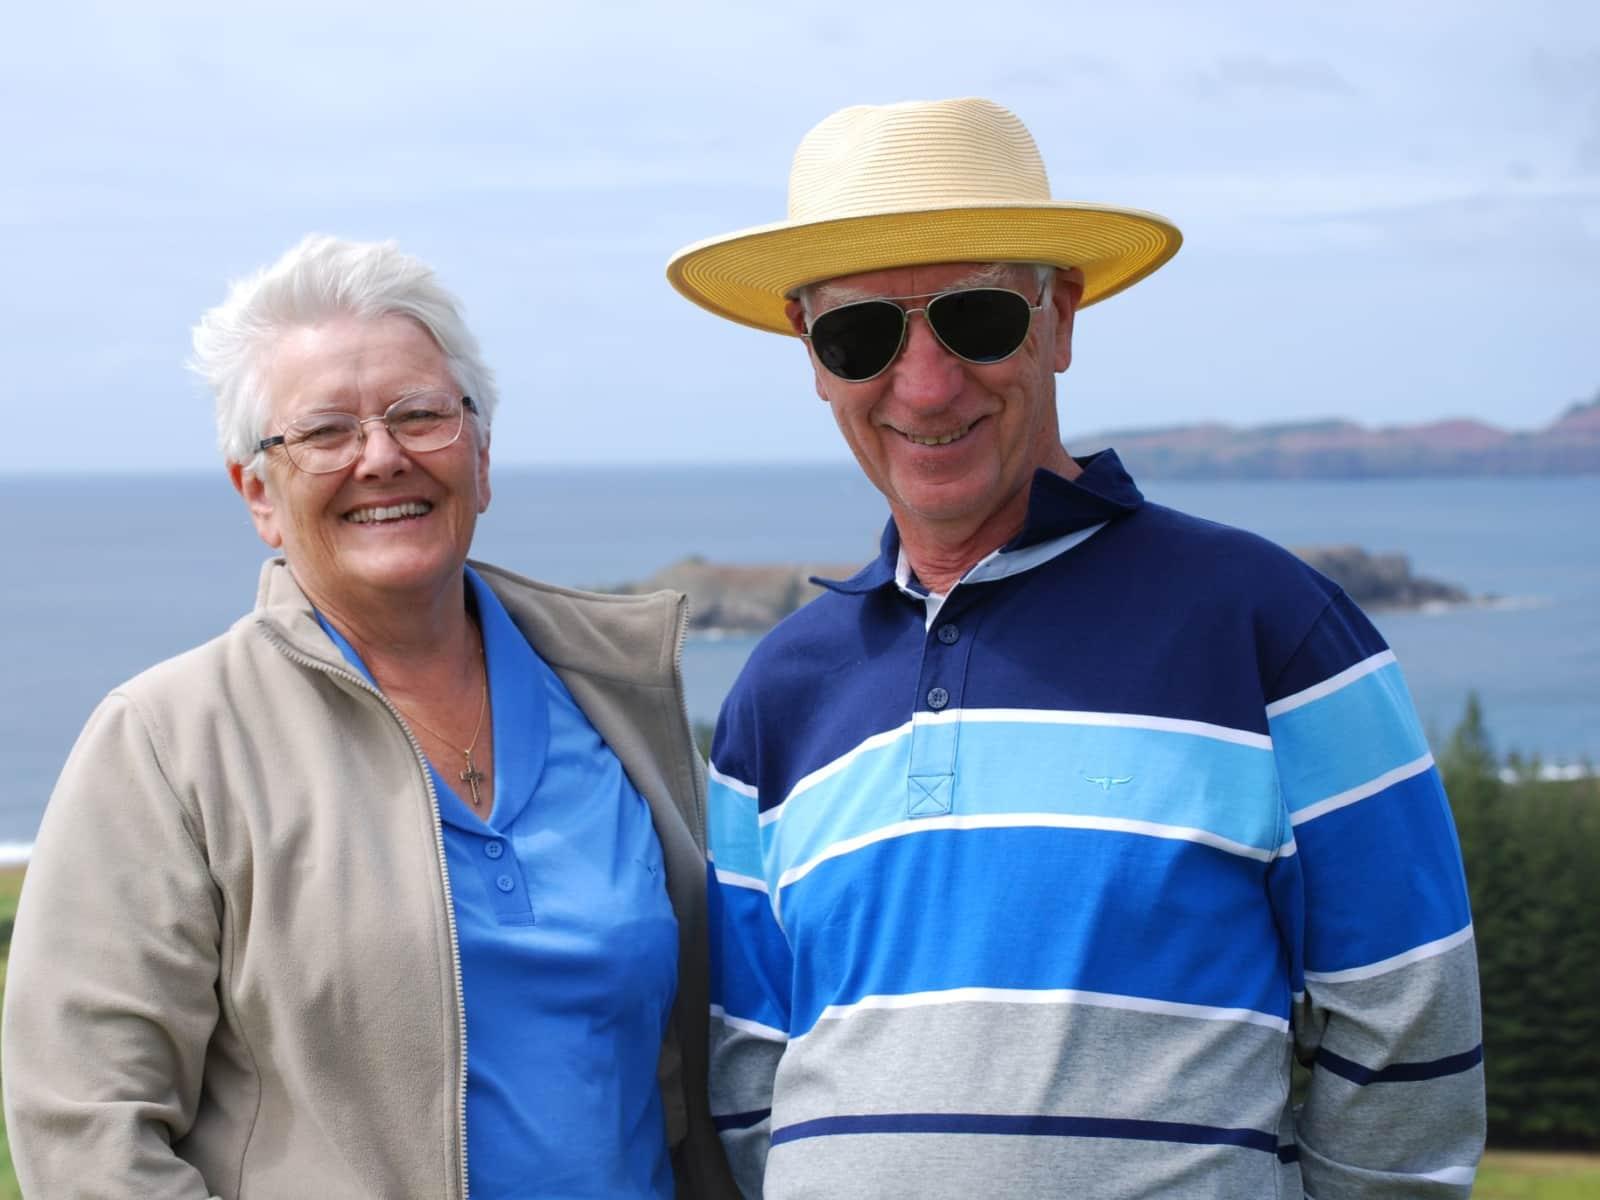 Joe & Susan from Yass, New South Wales, Australia